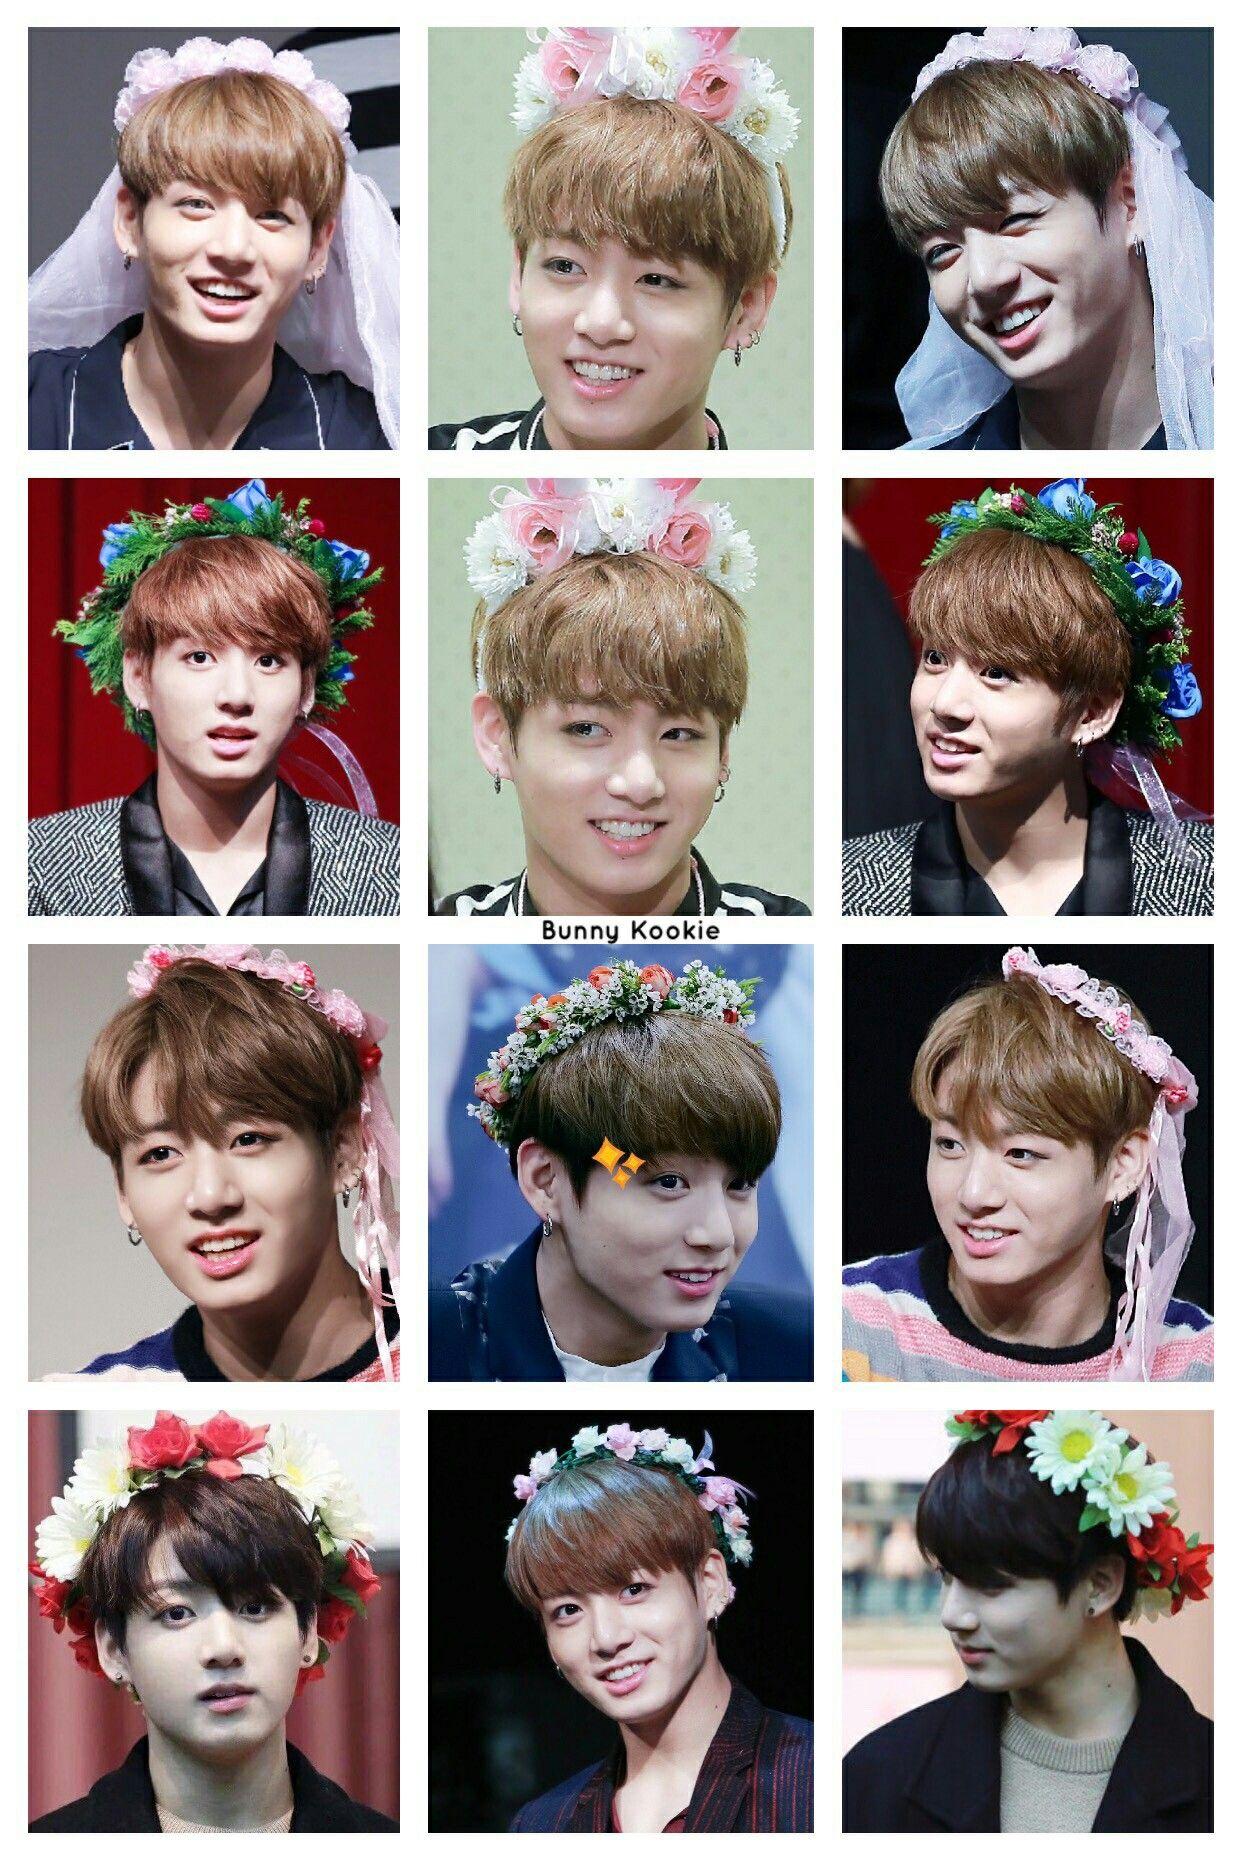 My Aesthetic Jungkook W Flower Crowns Bohemian Style In 2018